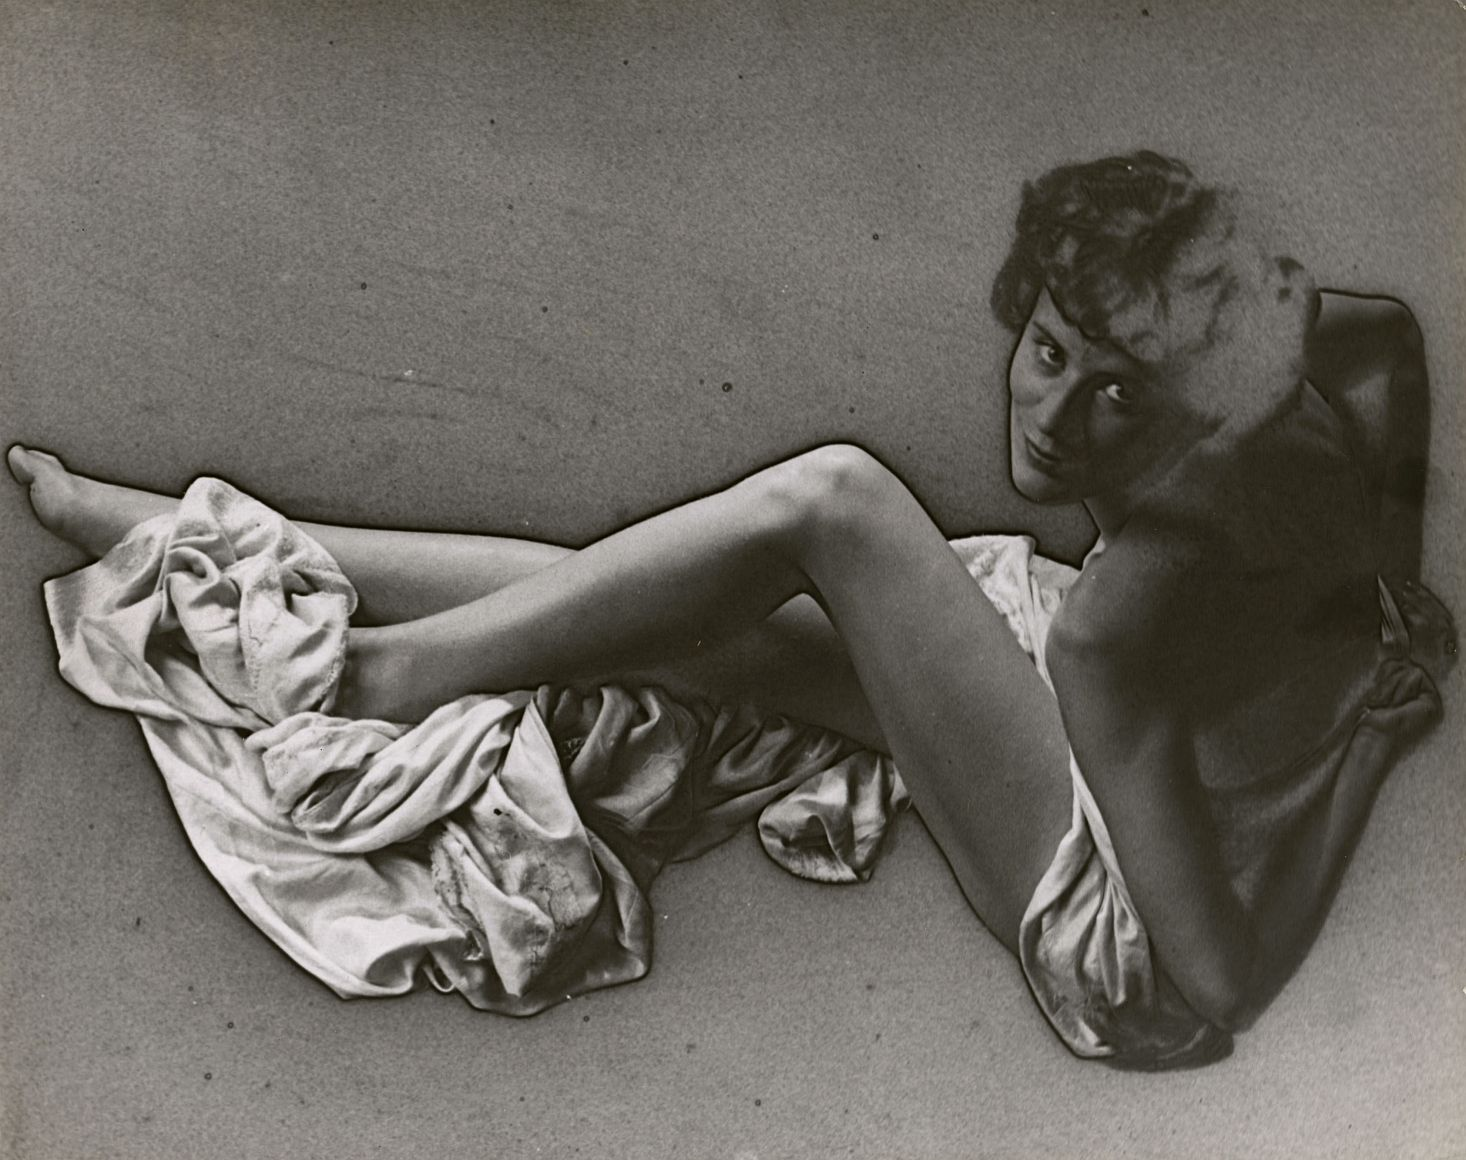 Erwin Blumenfeld, Untitled, n.d.